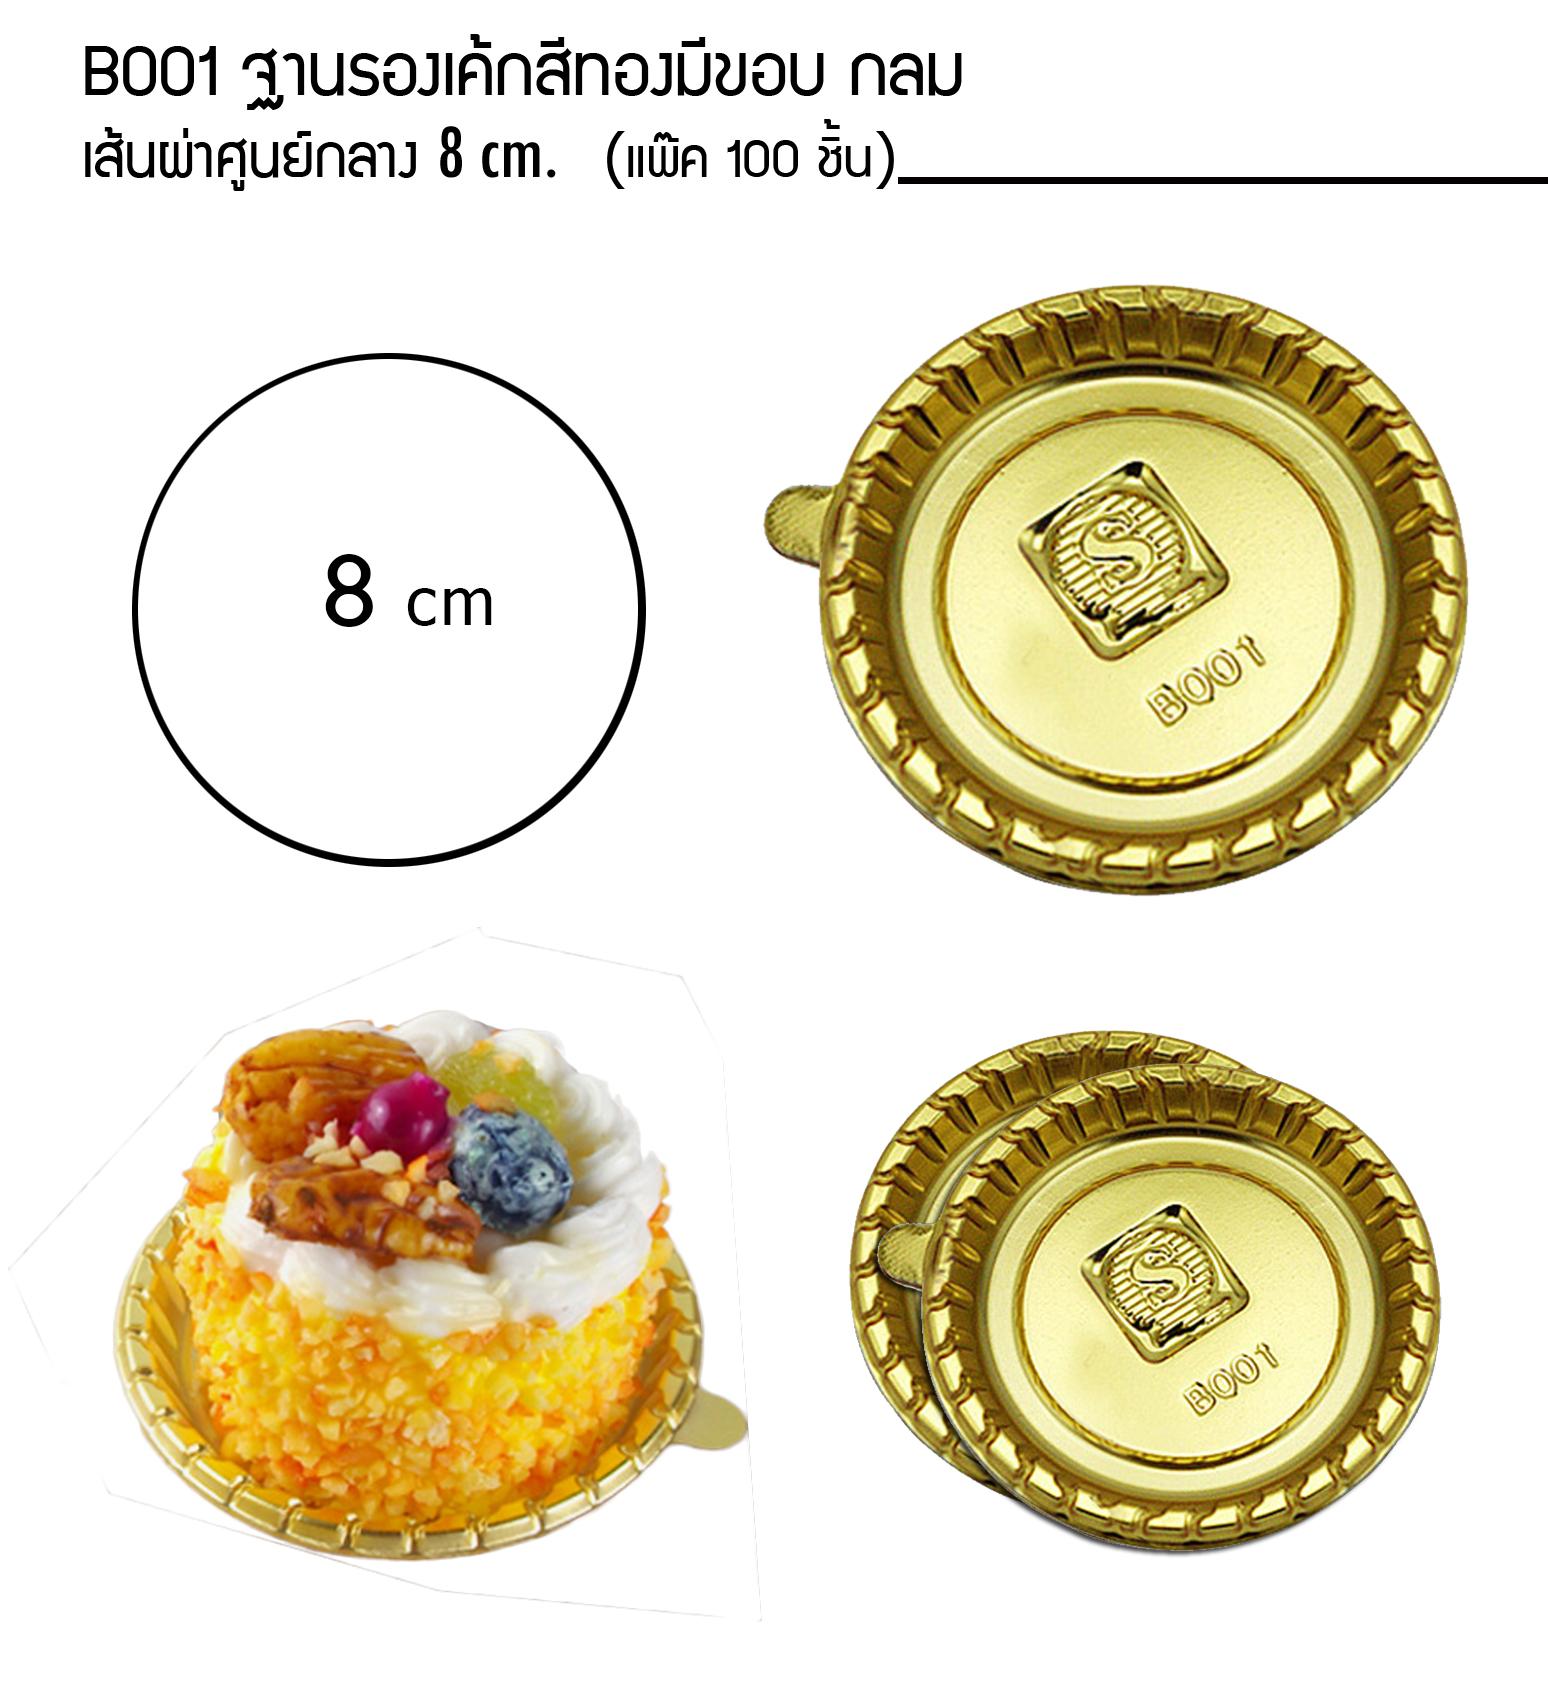 B001 ฐานรองเค้กสีทอง มีขอบ (แพ๊ค 100 ชิ้น) 8 cm.